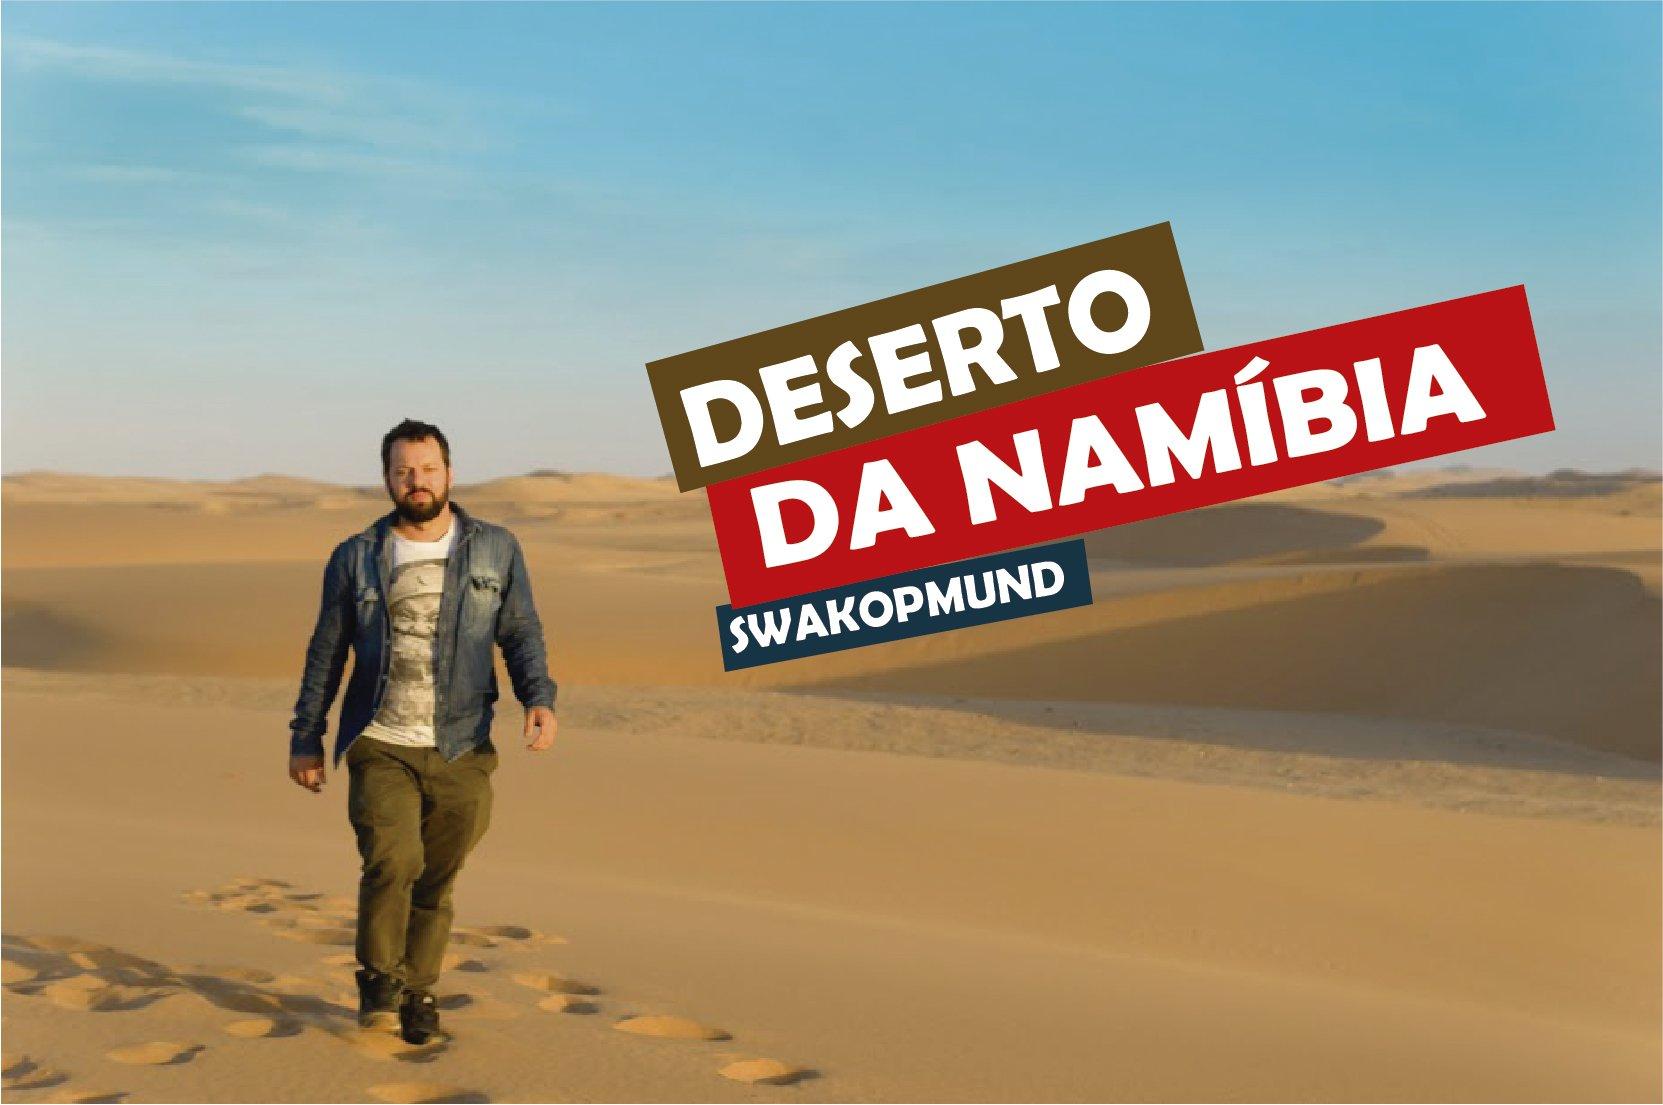 Deserto da Namíbia, Swakopmund